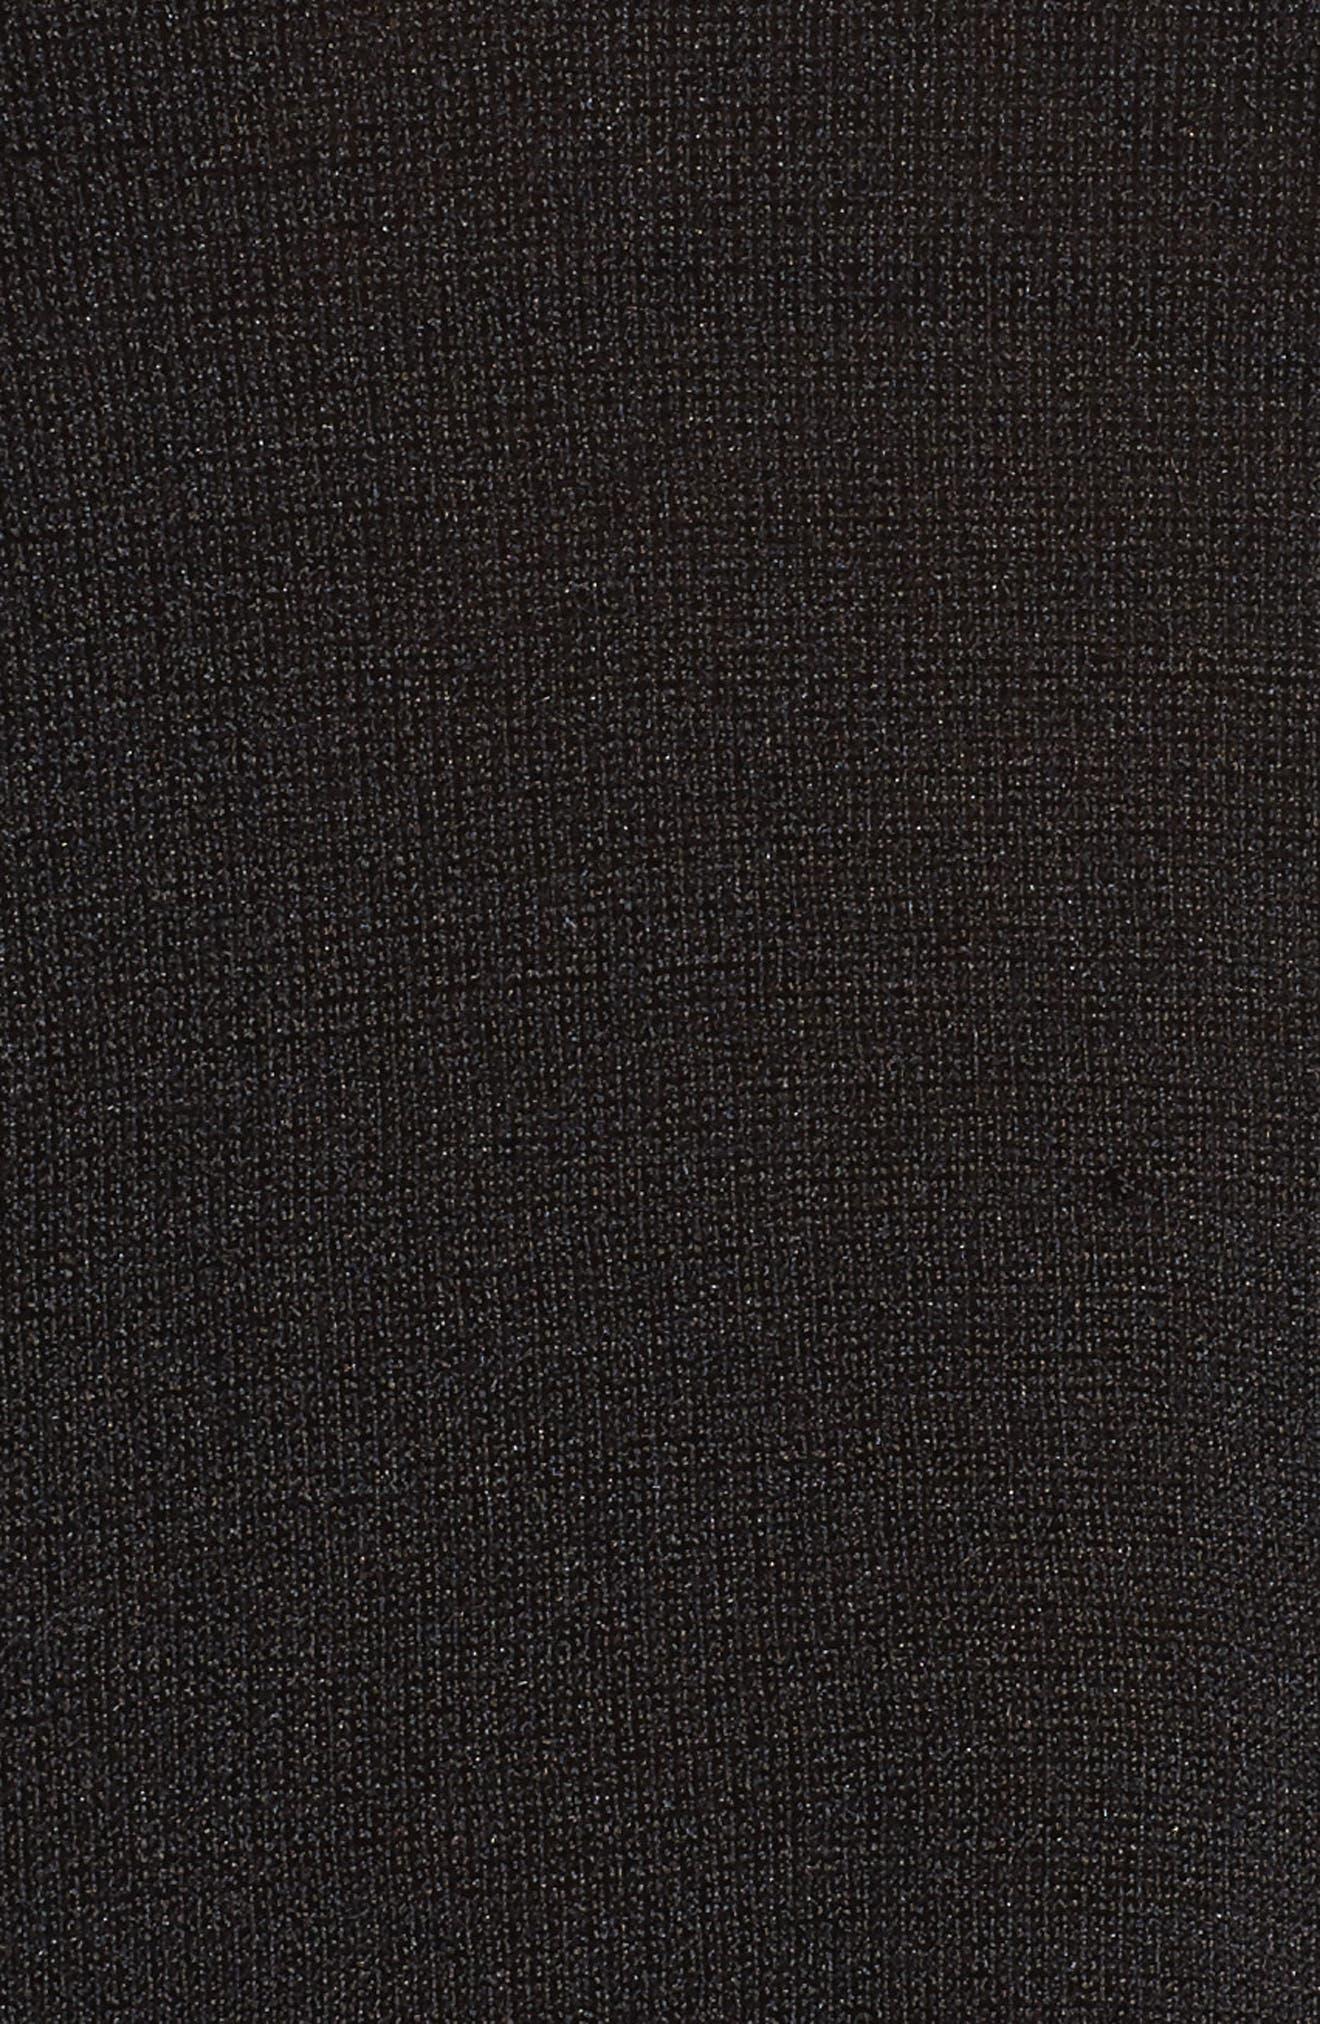 Chiffon Trim Tank,                             Alternate thumbnail 5, color,                             Black Onyx